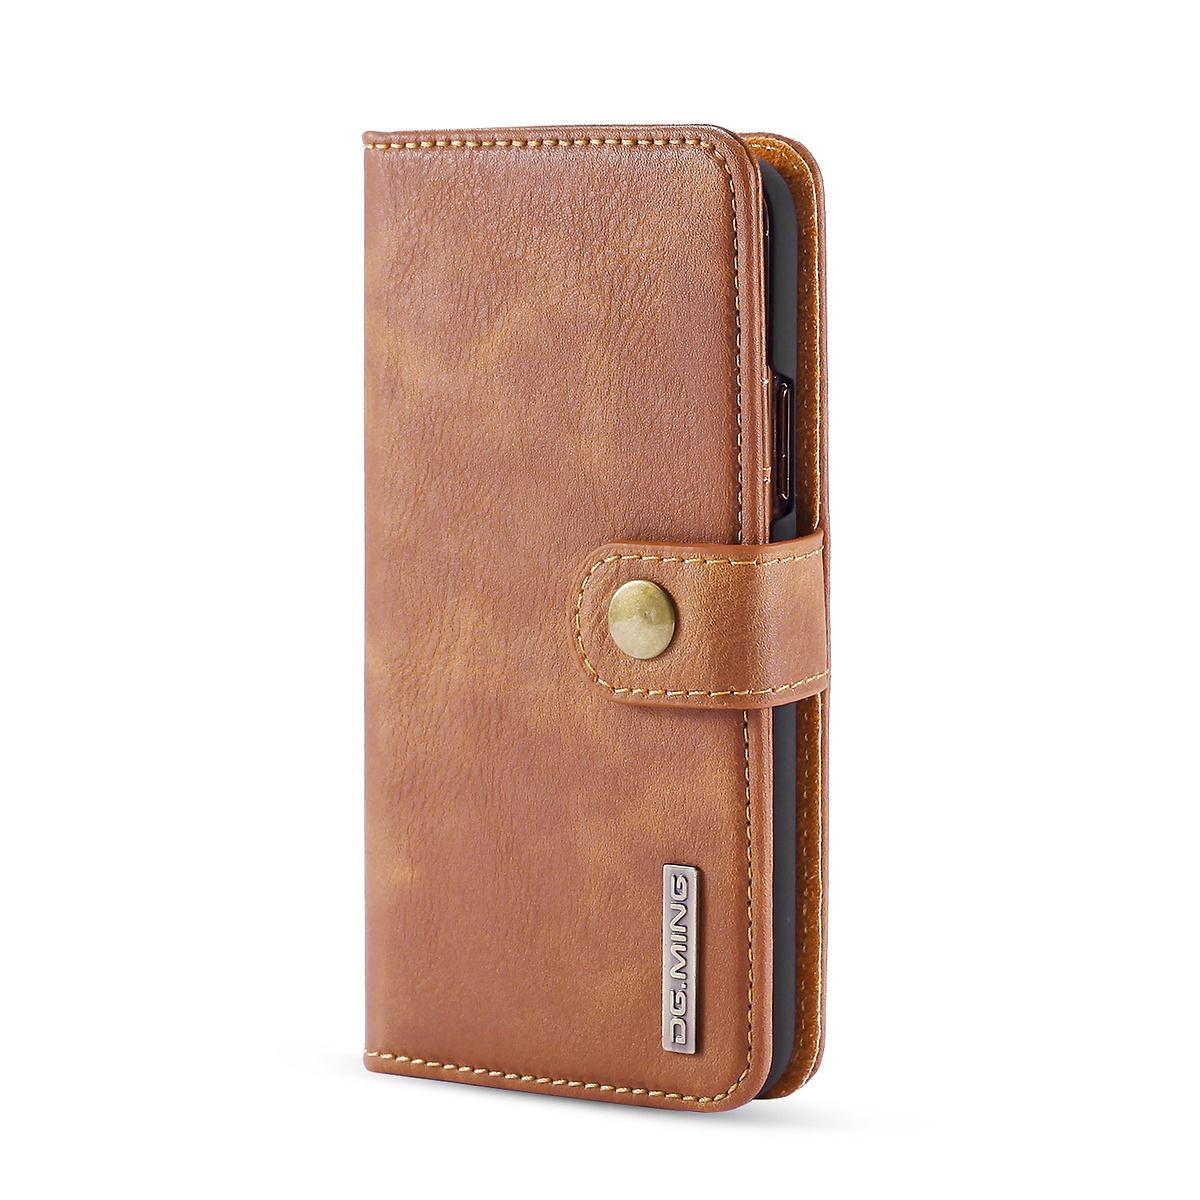 DG.MING fodral med magnetskal & ställ, iPhone 11 Pro, brun